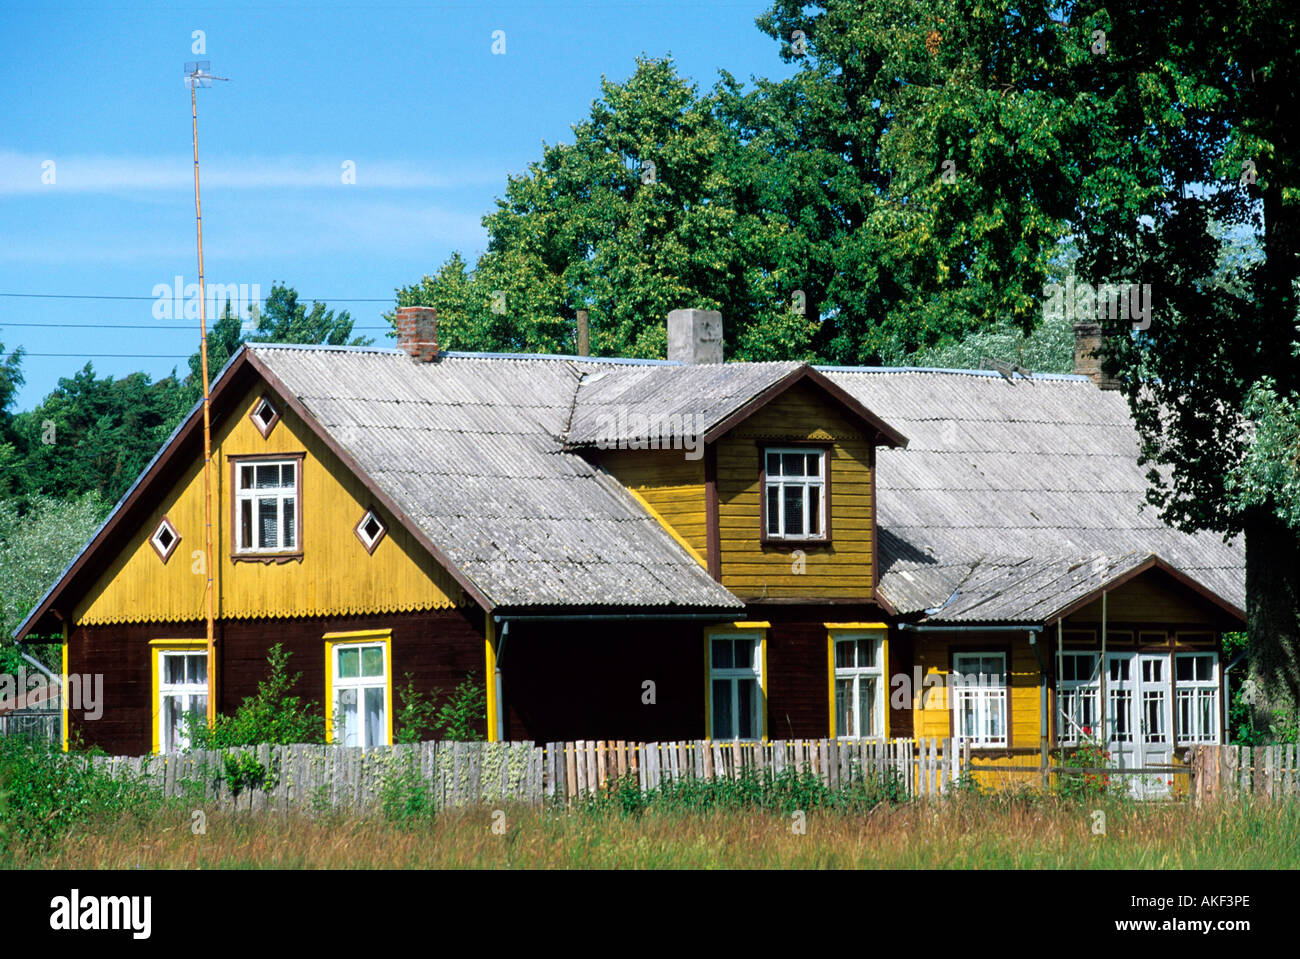 lettland haus bei valdemarpils stockfoto bild 8561069 alamy